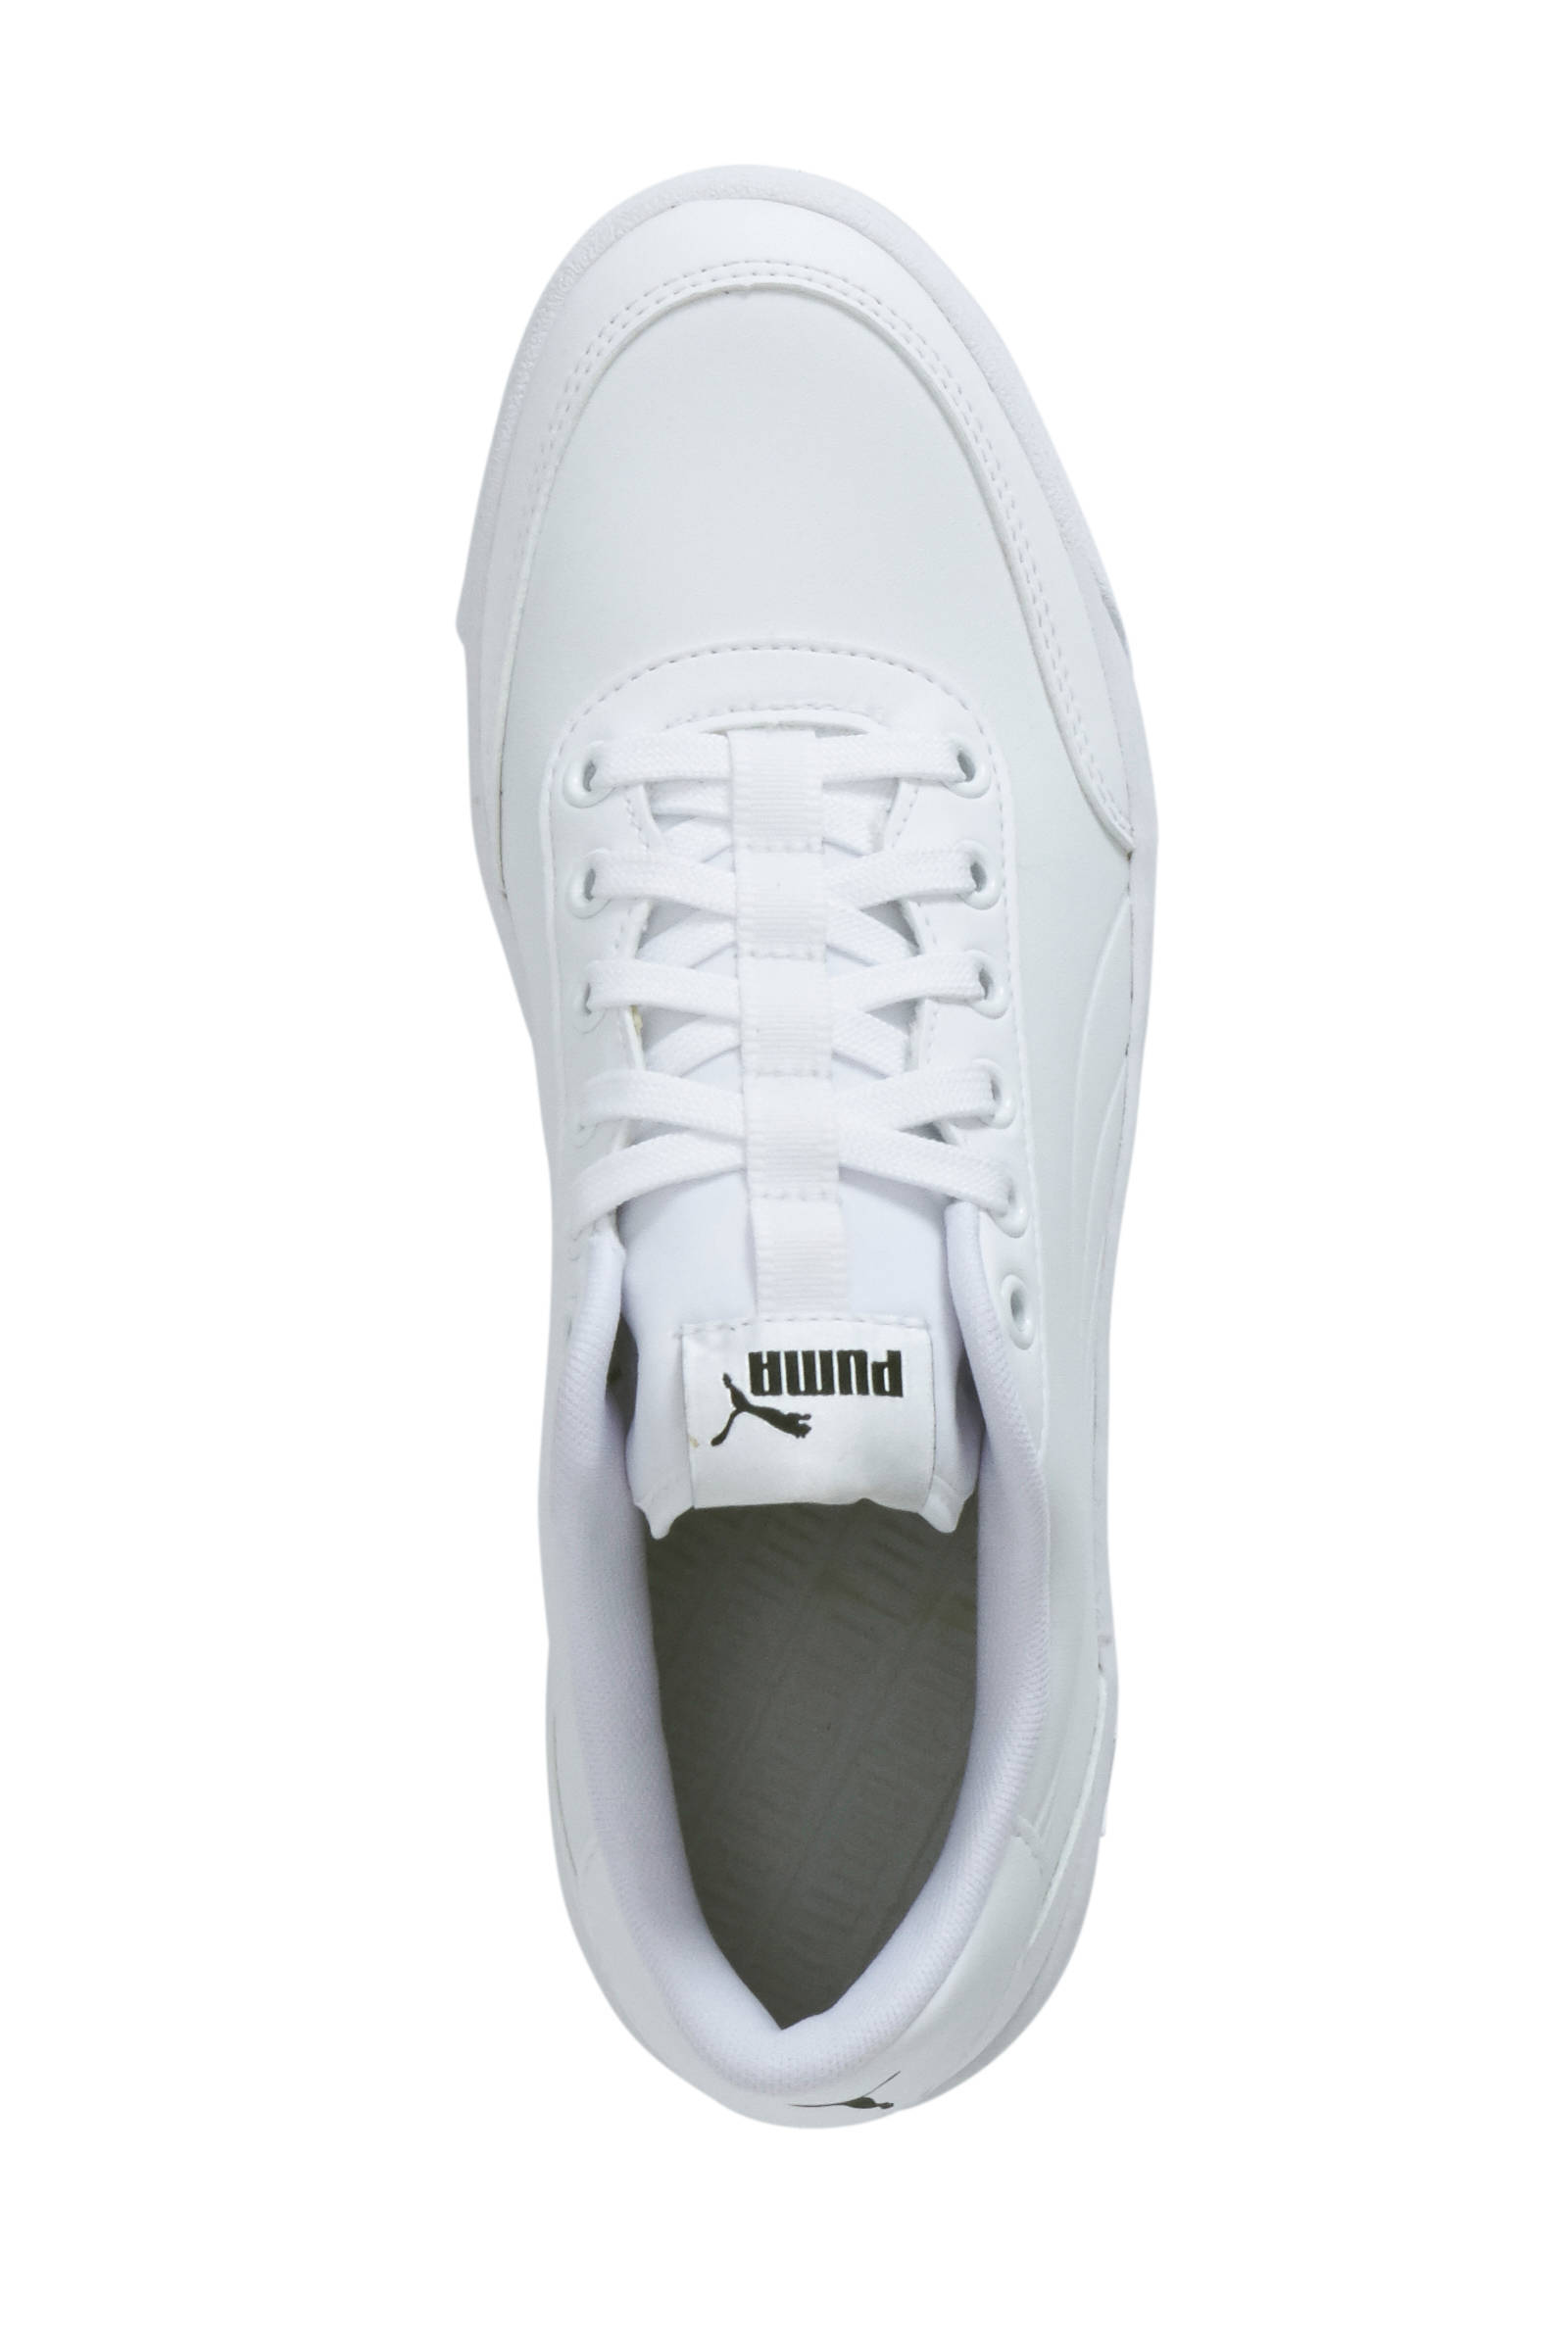 Sidi black Cape 2017 Fietsen schoenen Heren nbsp;mountainbike FietsschoenenZwart48 Black Eu vNnw8mO0